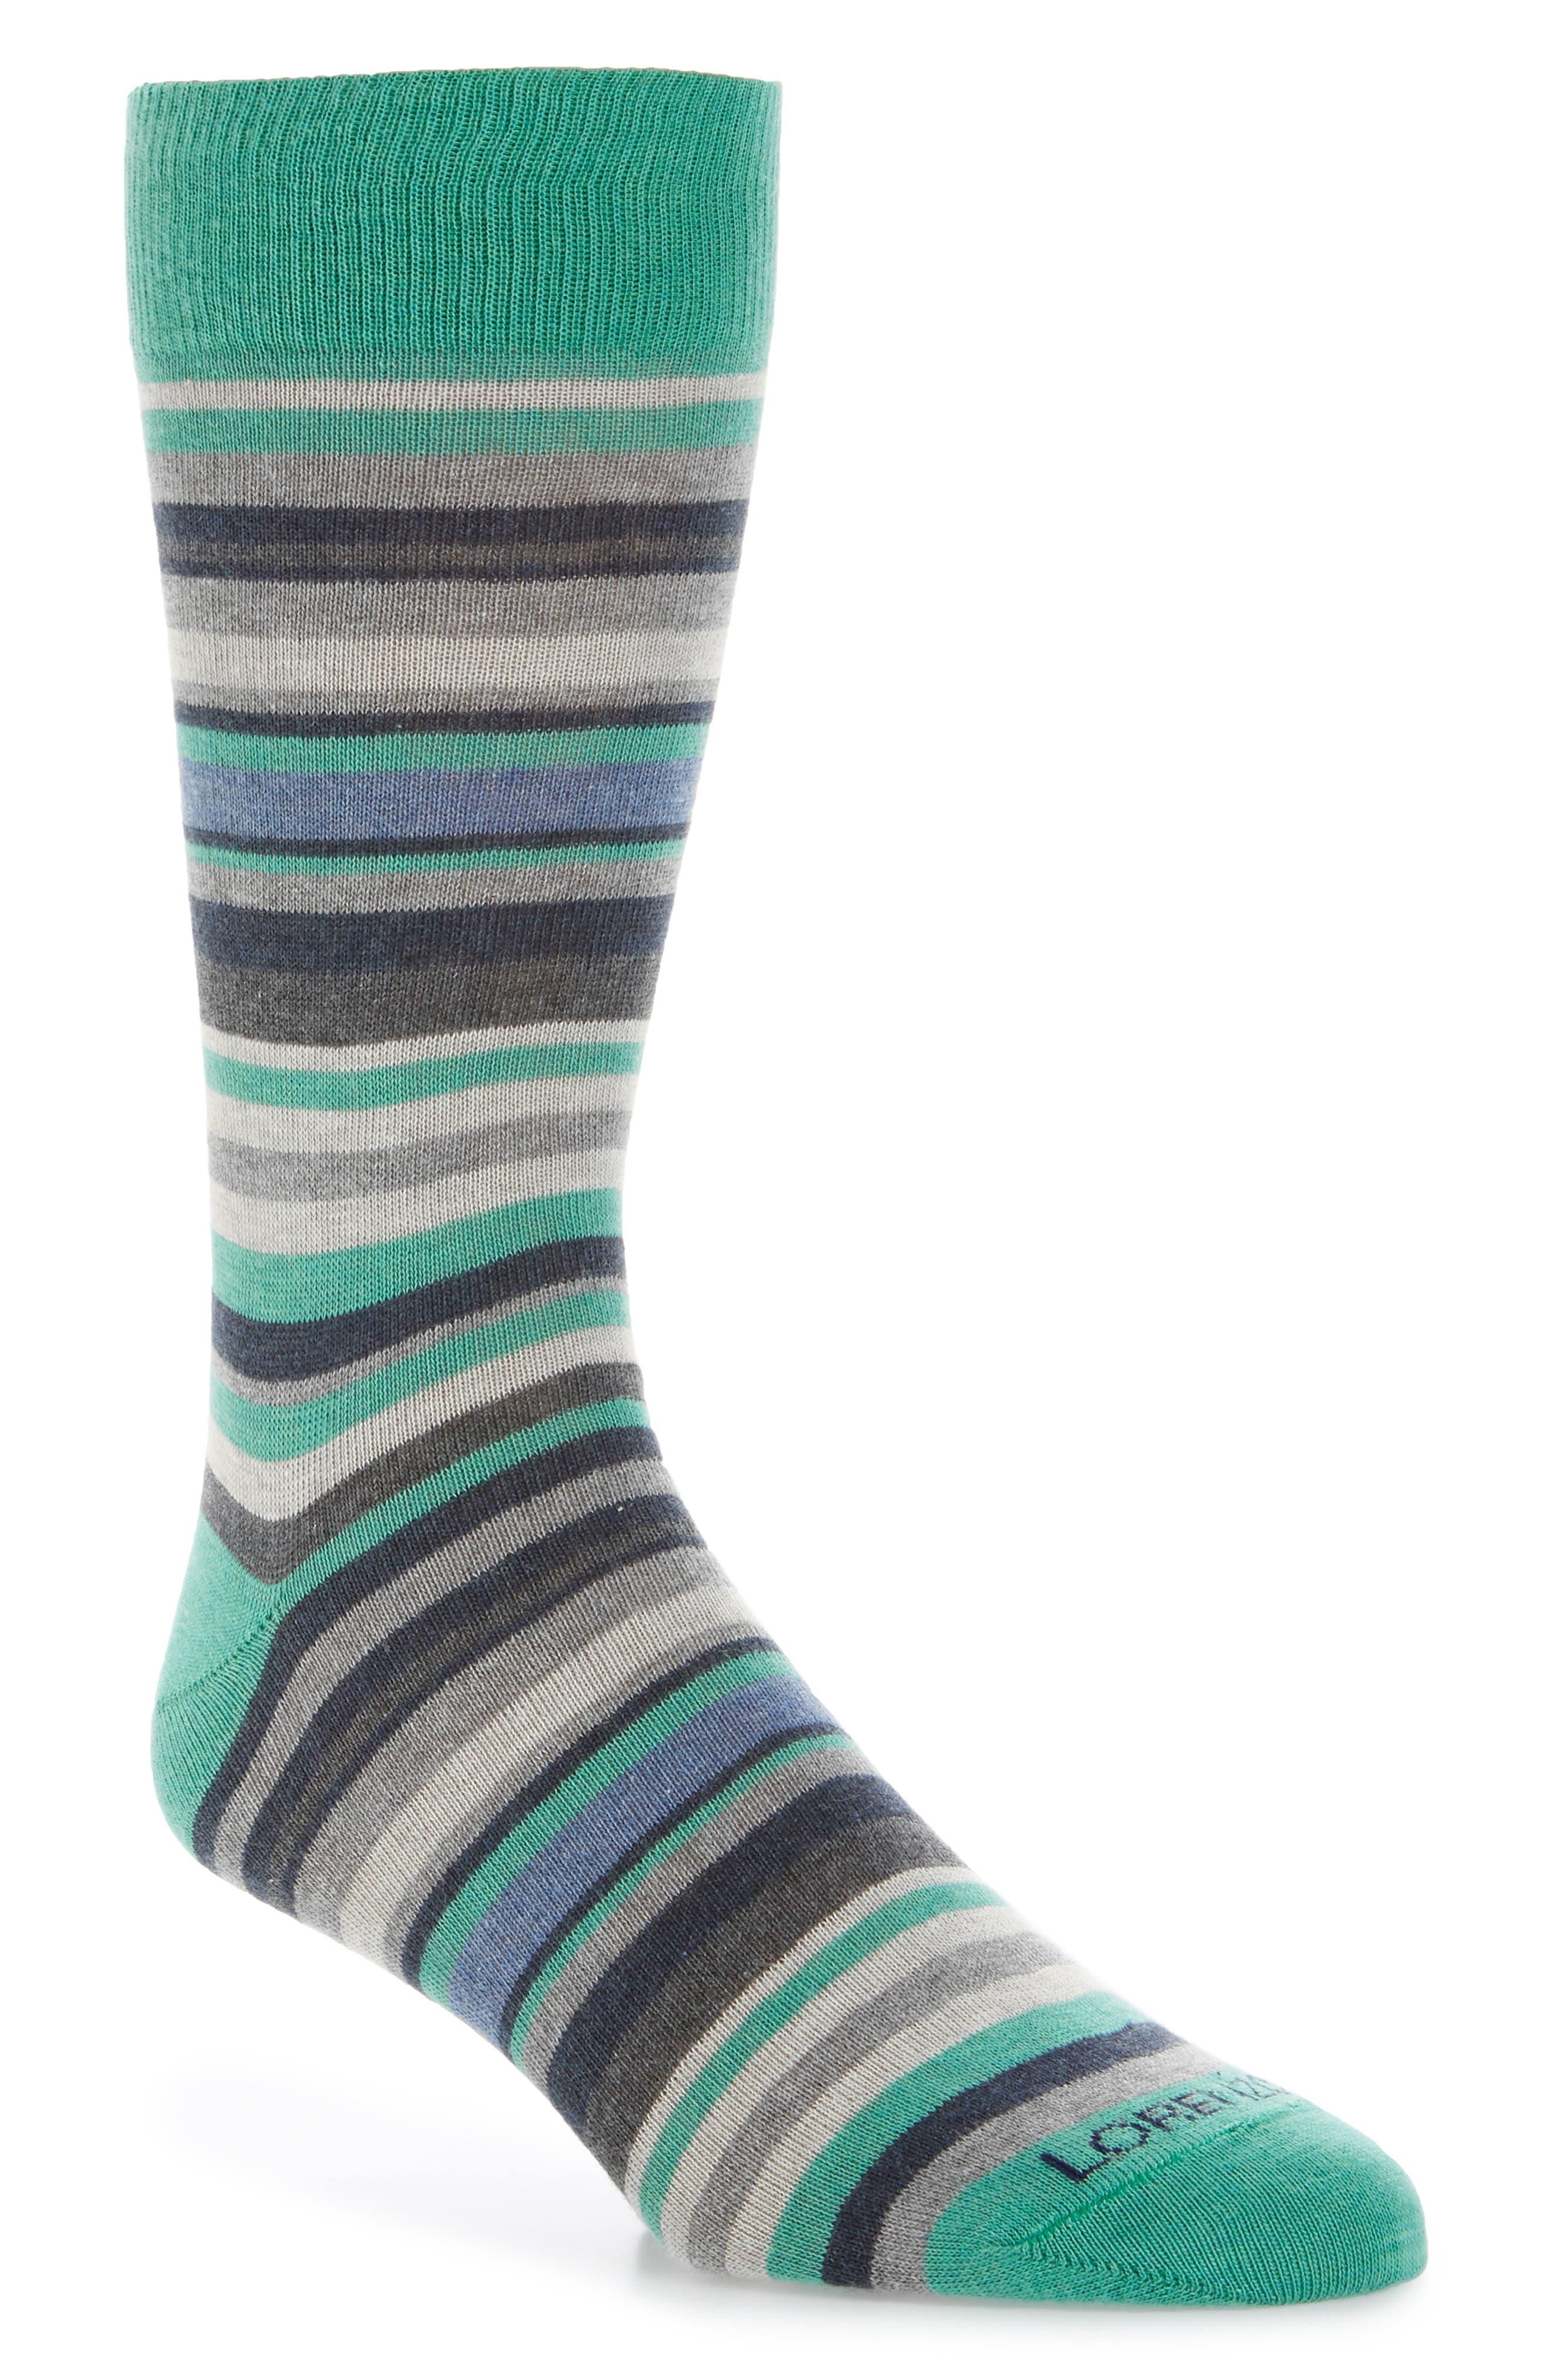 Stripe Cotton Blend Socks,                             Main thumbnail 1, color,                             021